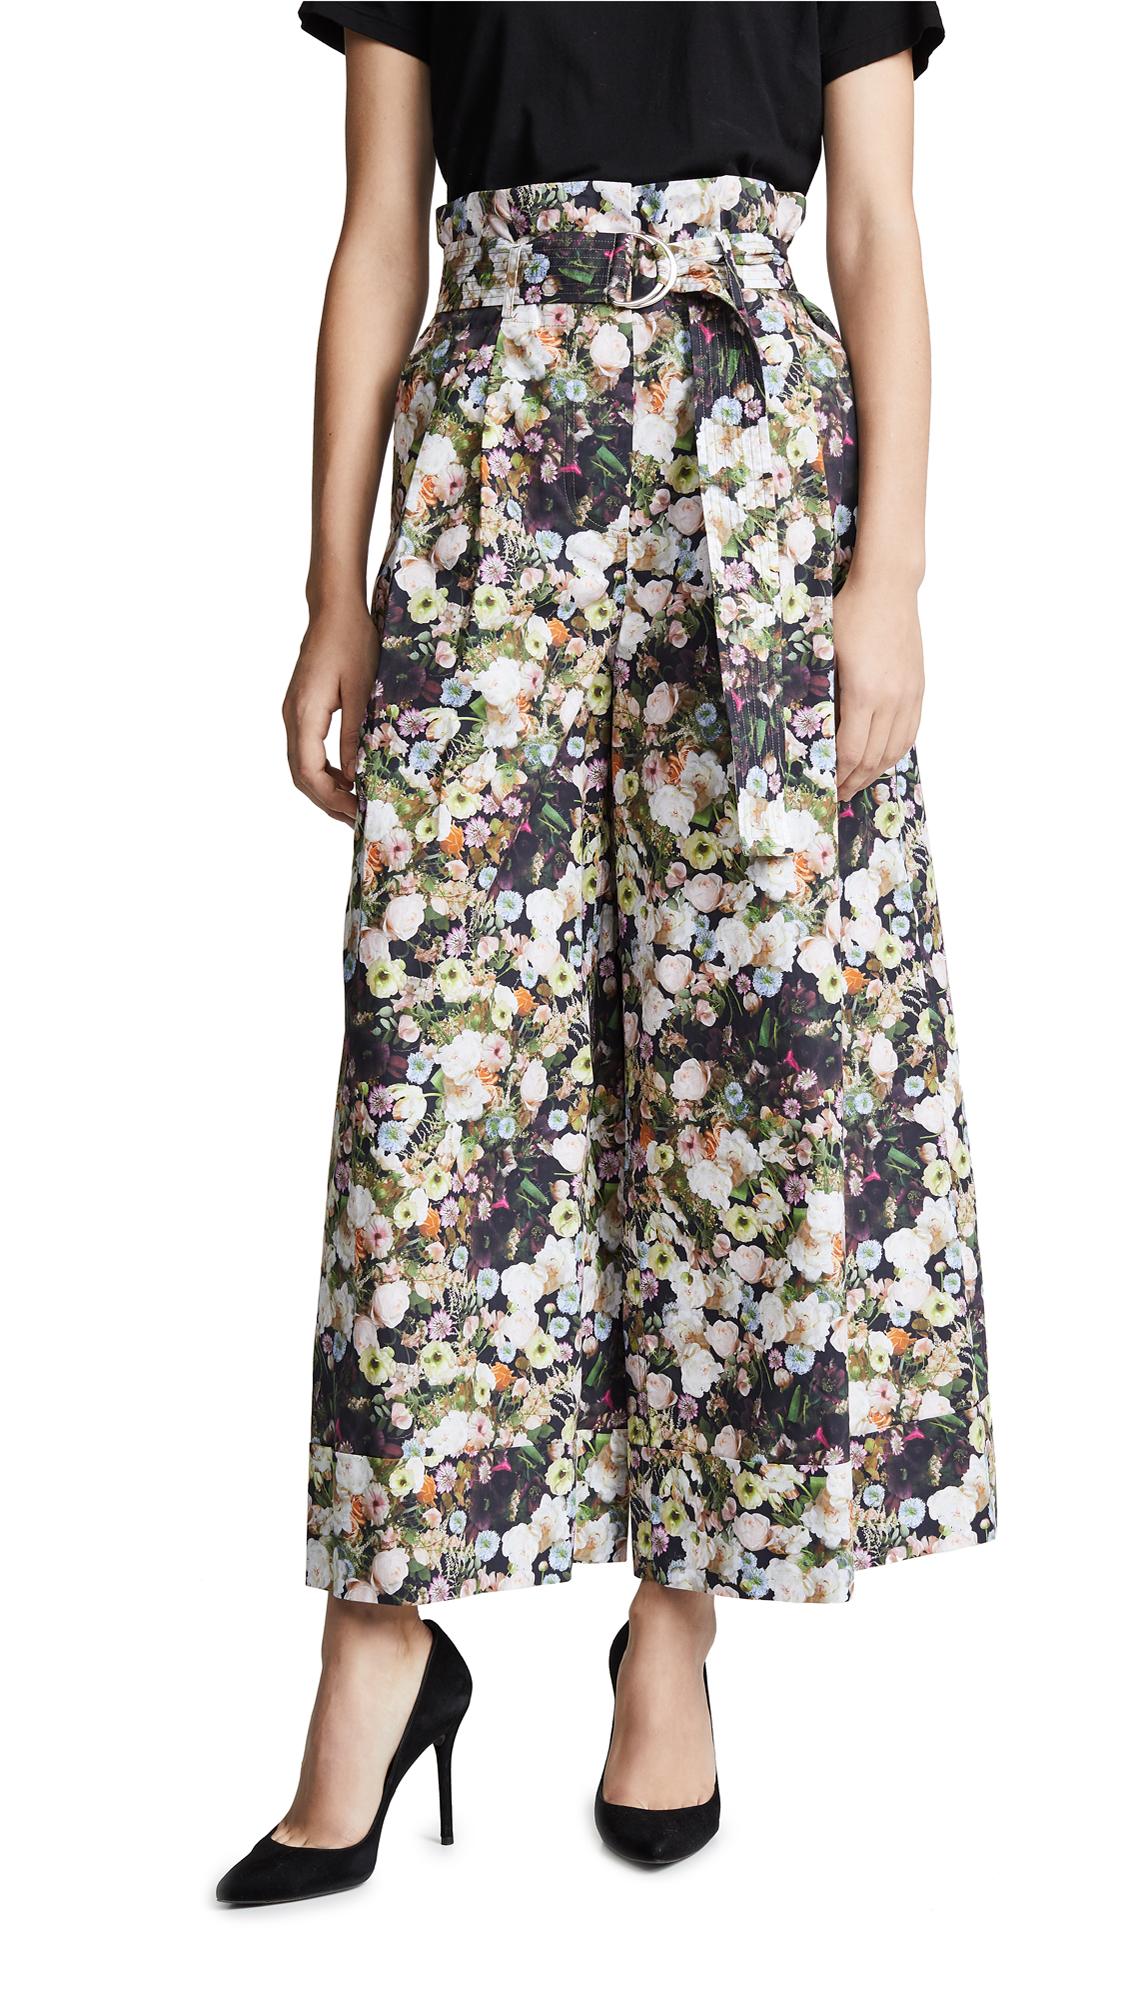 Adam Lippes Printed Poplin Tie Waist Culottes - Black Floral